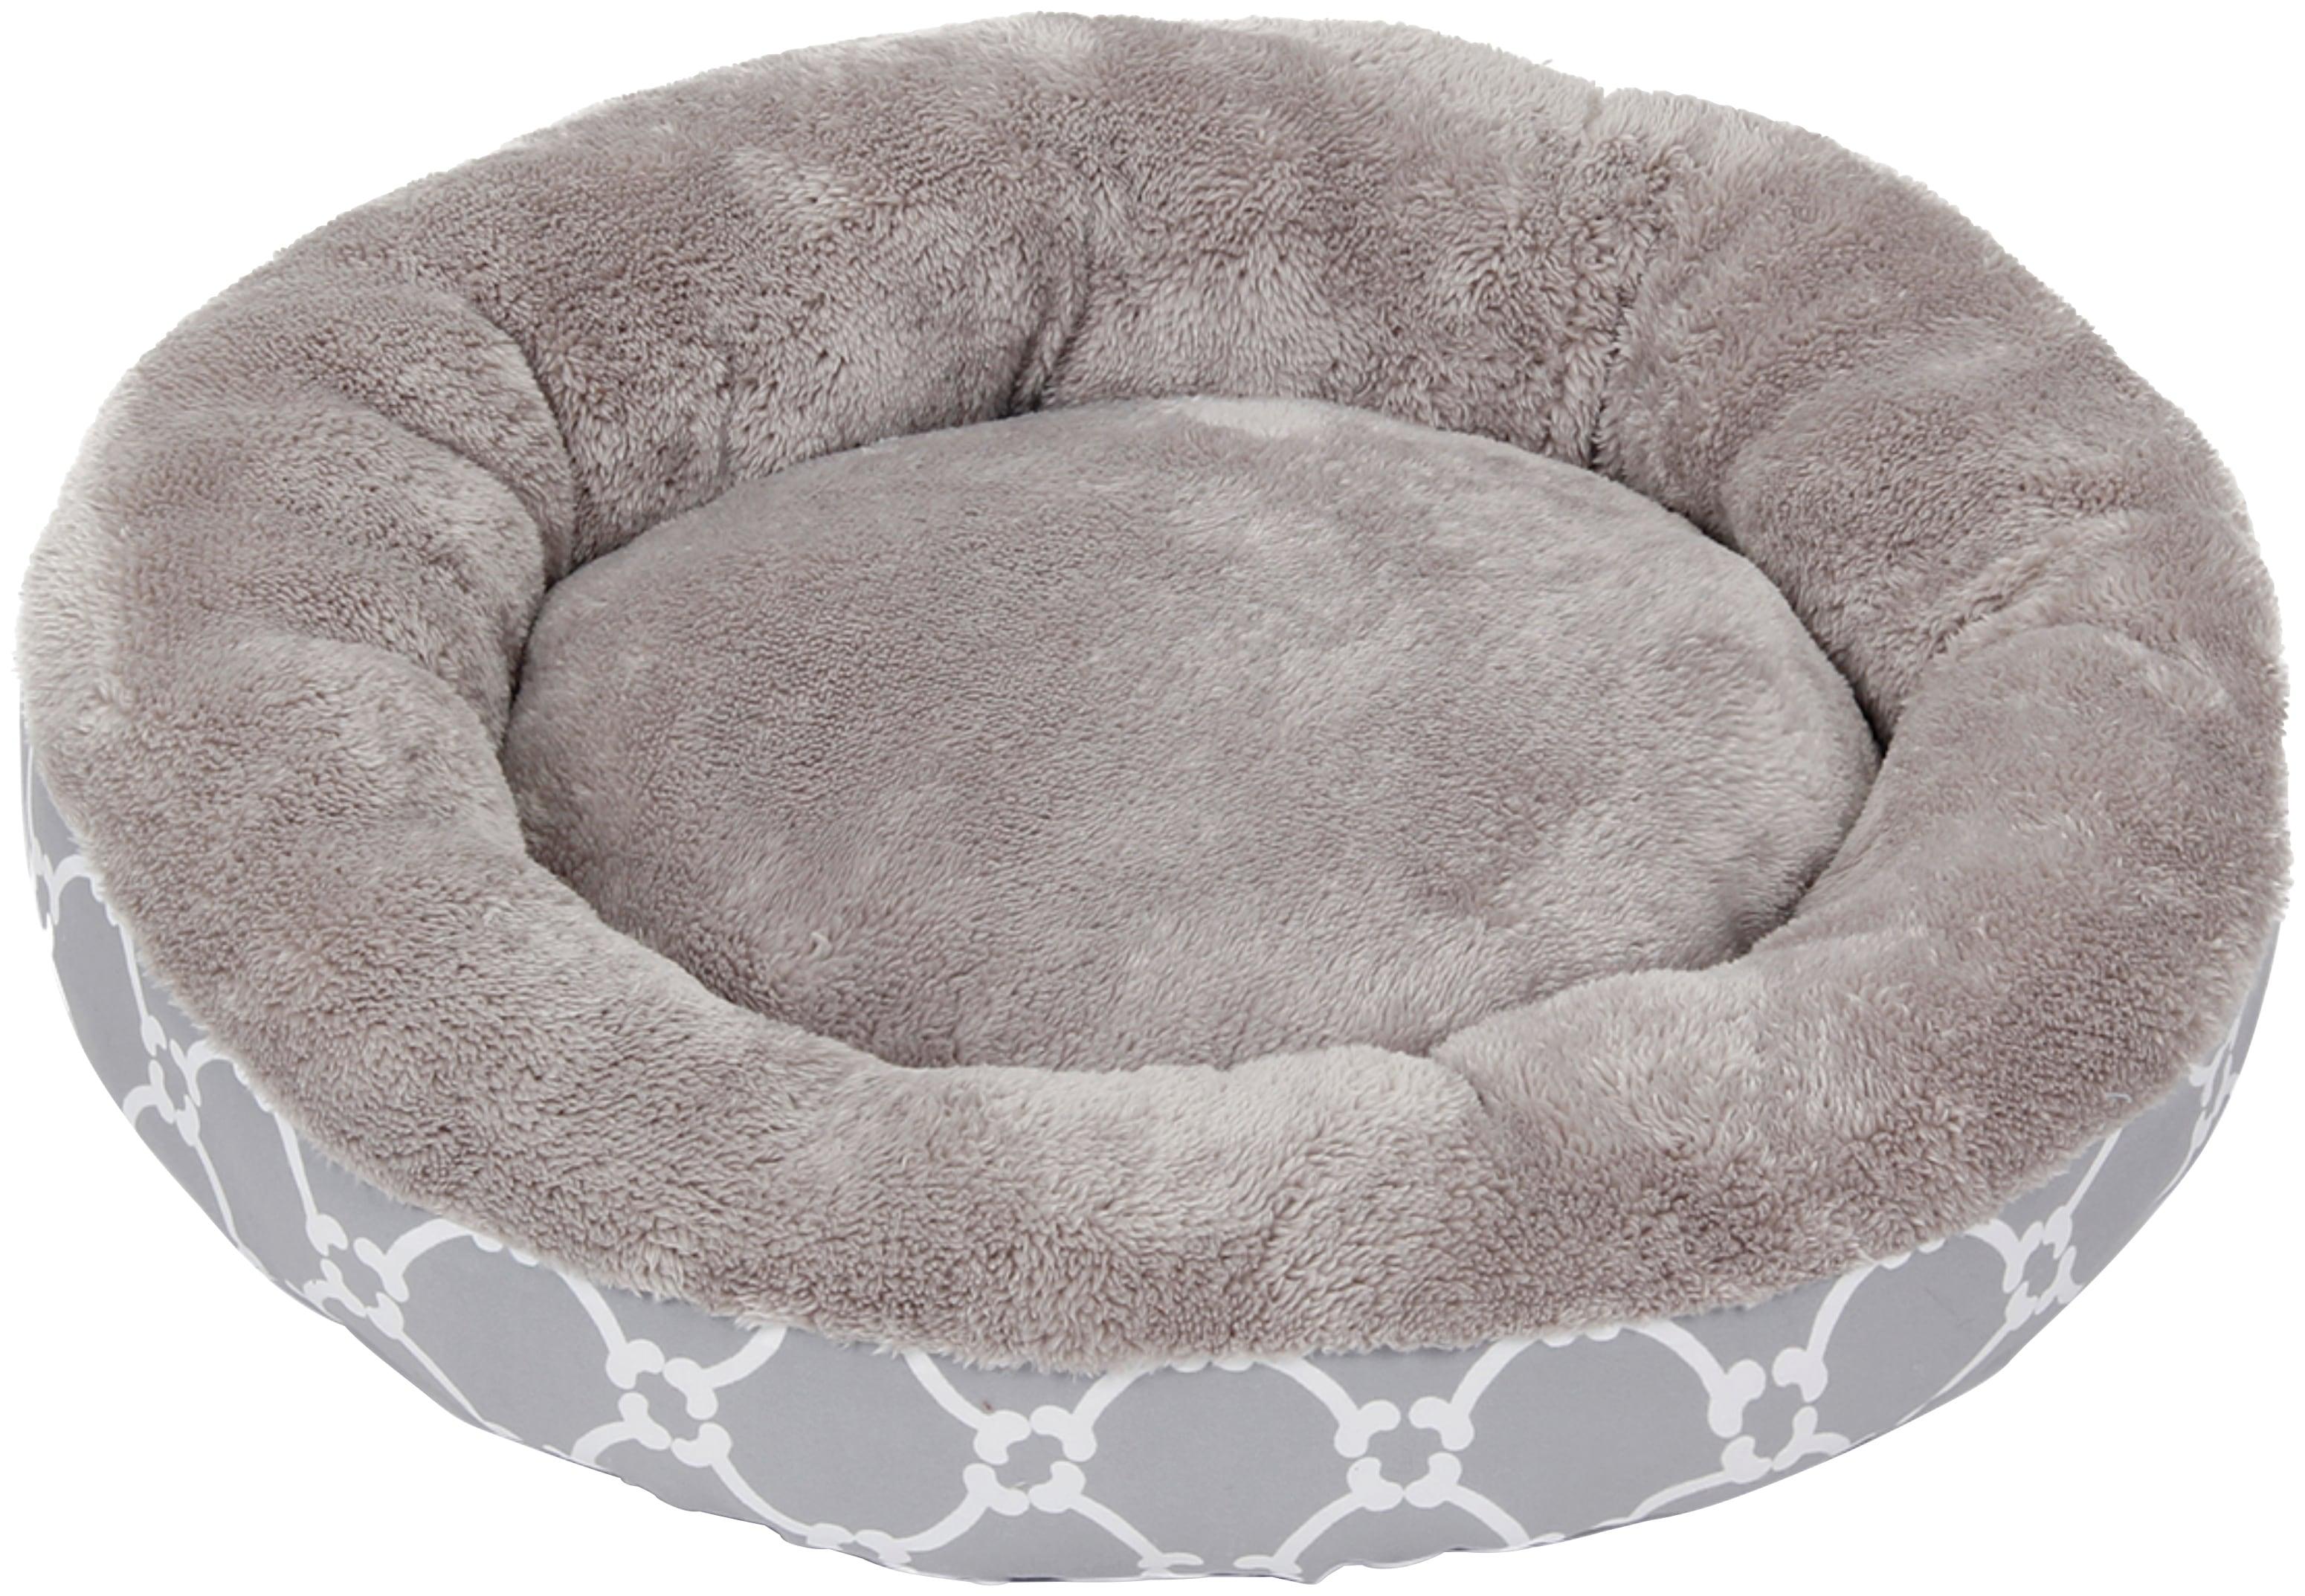 HEIM Hundebett und Katzenbett »Donat - Flower«, Fleece, Pastellfarben